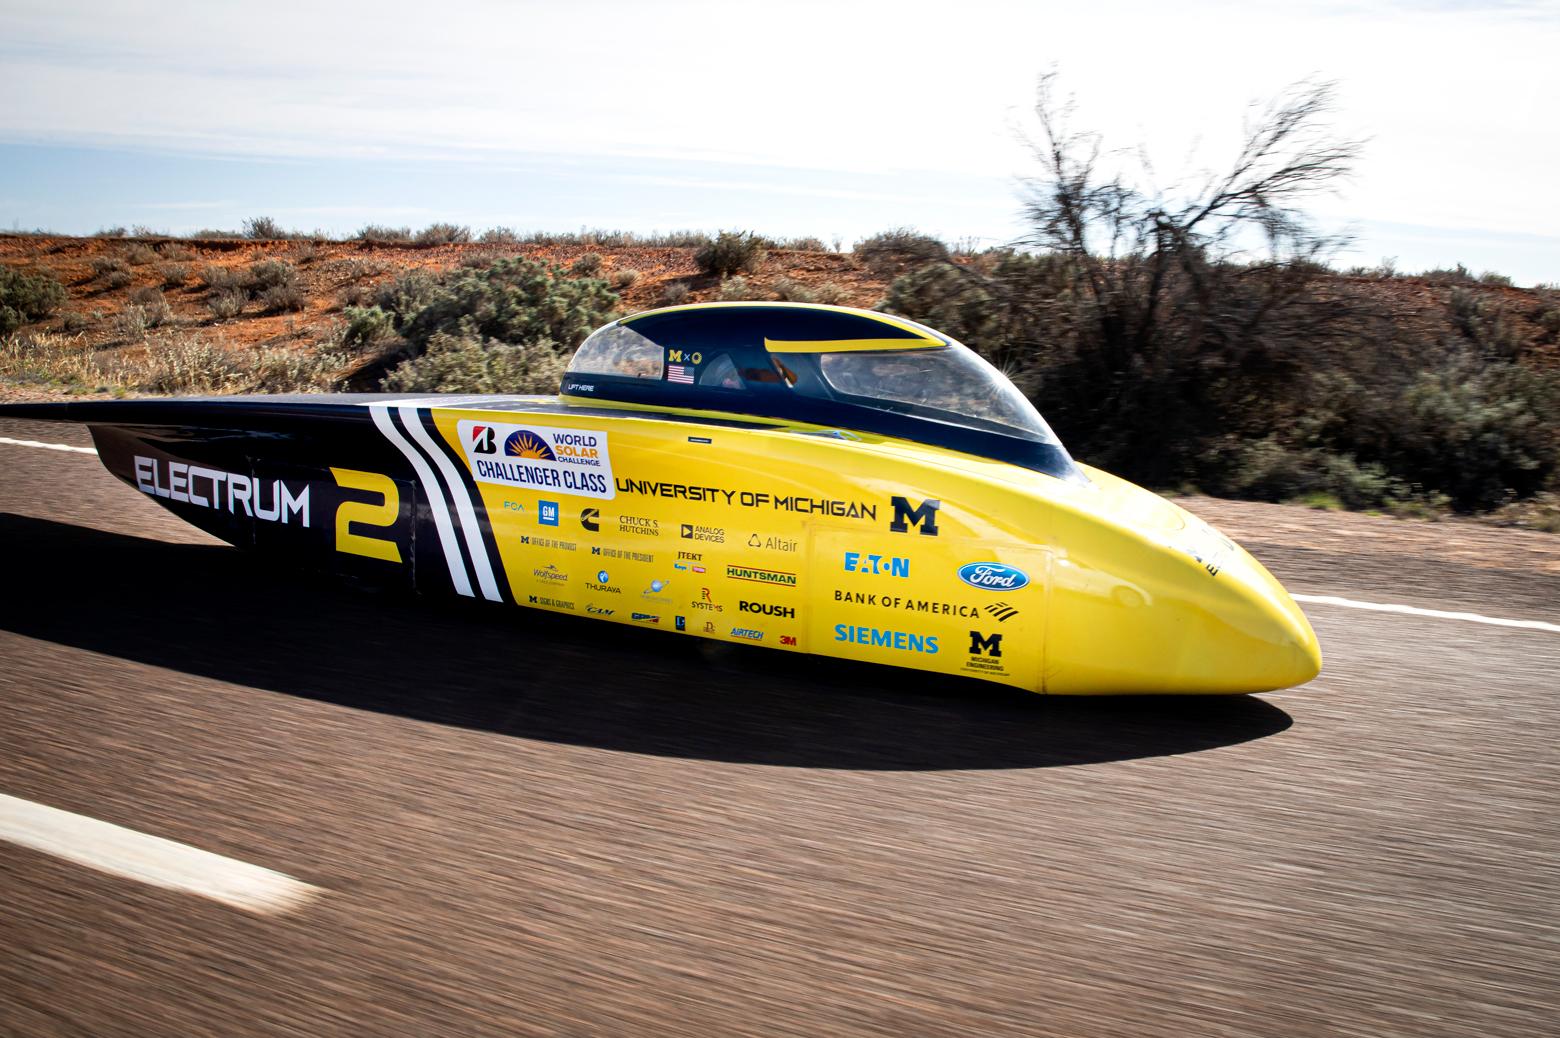 Electrum cruises down Australia's Stuart Highway in third place on the final day of racing. Photo: Joseph Xu/Michigan Engineering